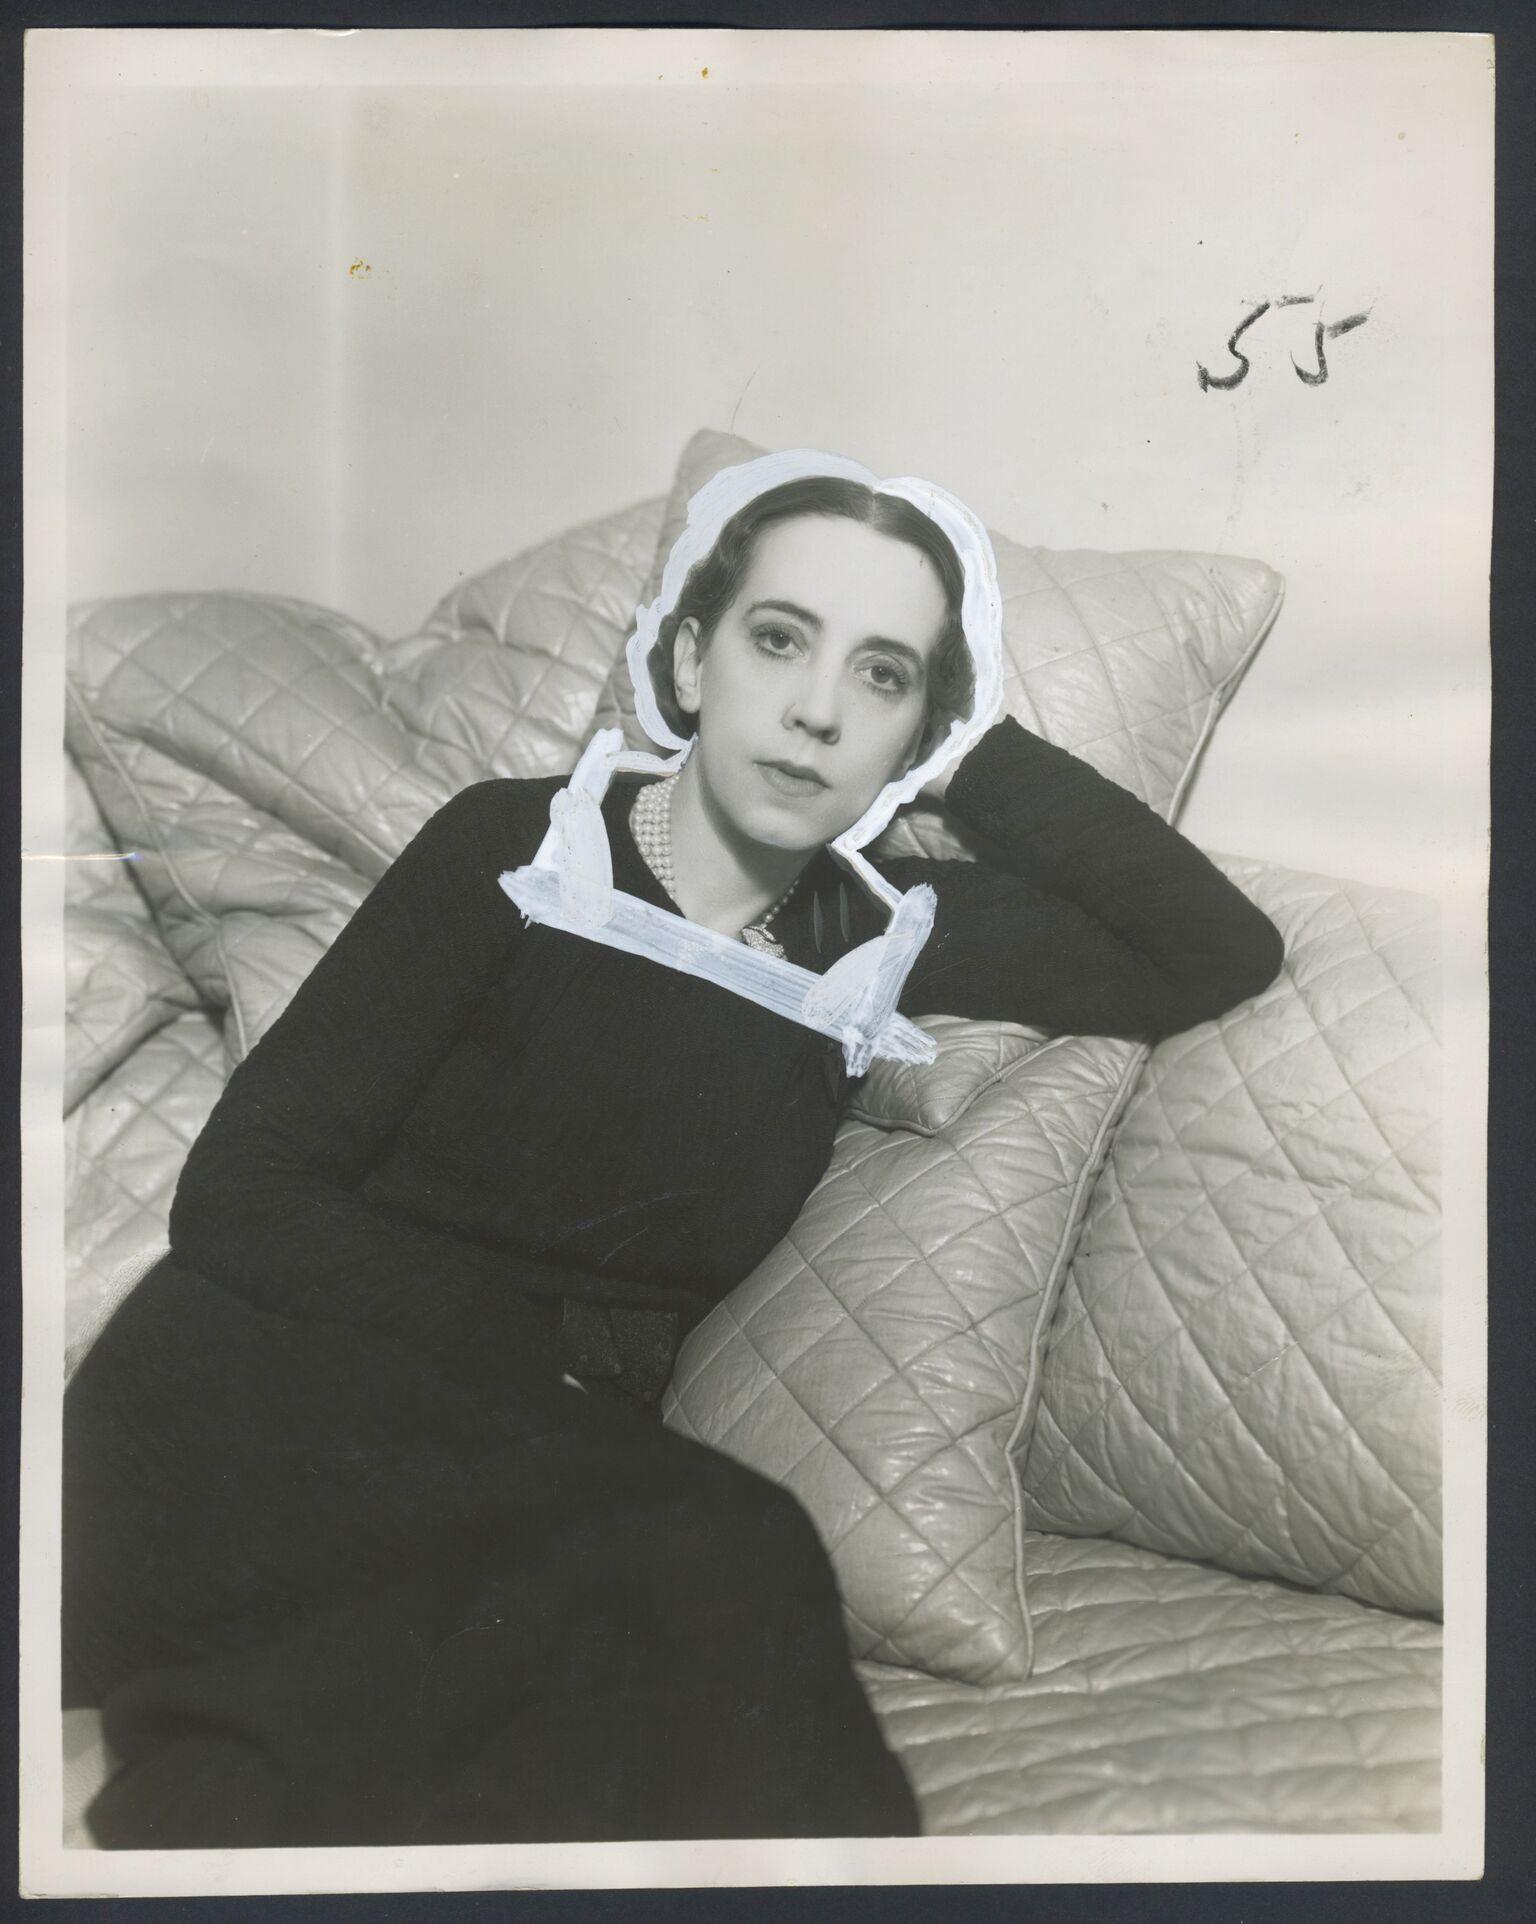 Press Photograph, 1936